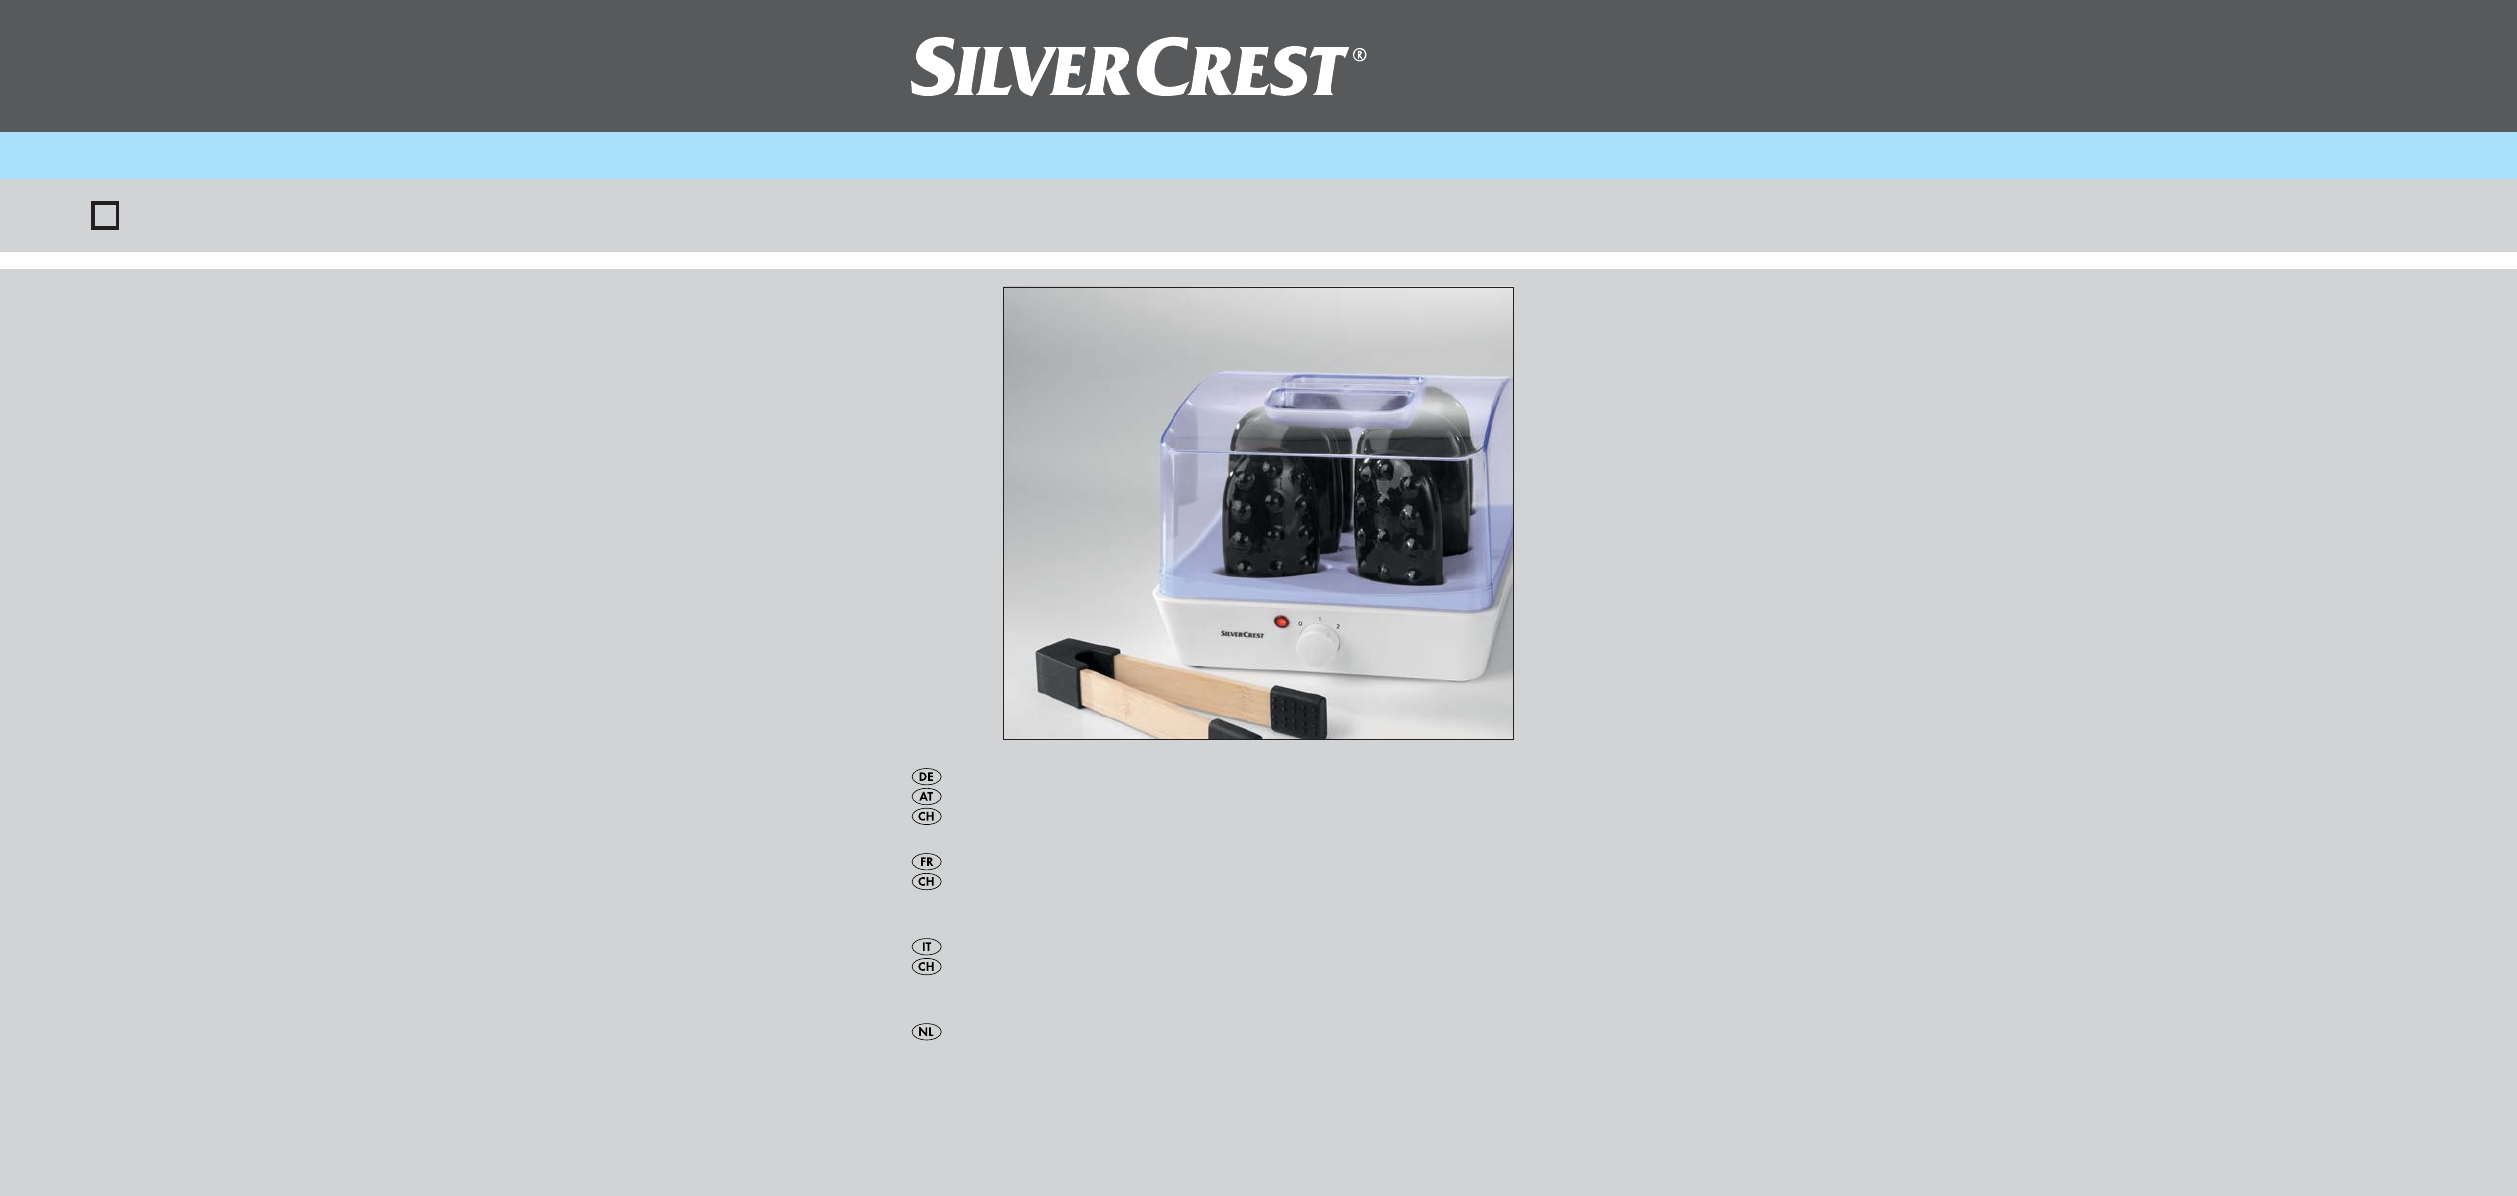 Imetec Sensuij Mc1 200.Handleiding Silvercrest Shs 220 A1 58 Pagina S